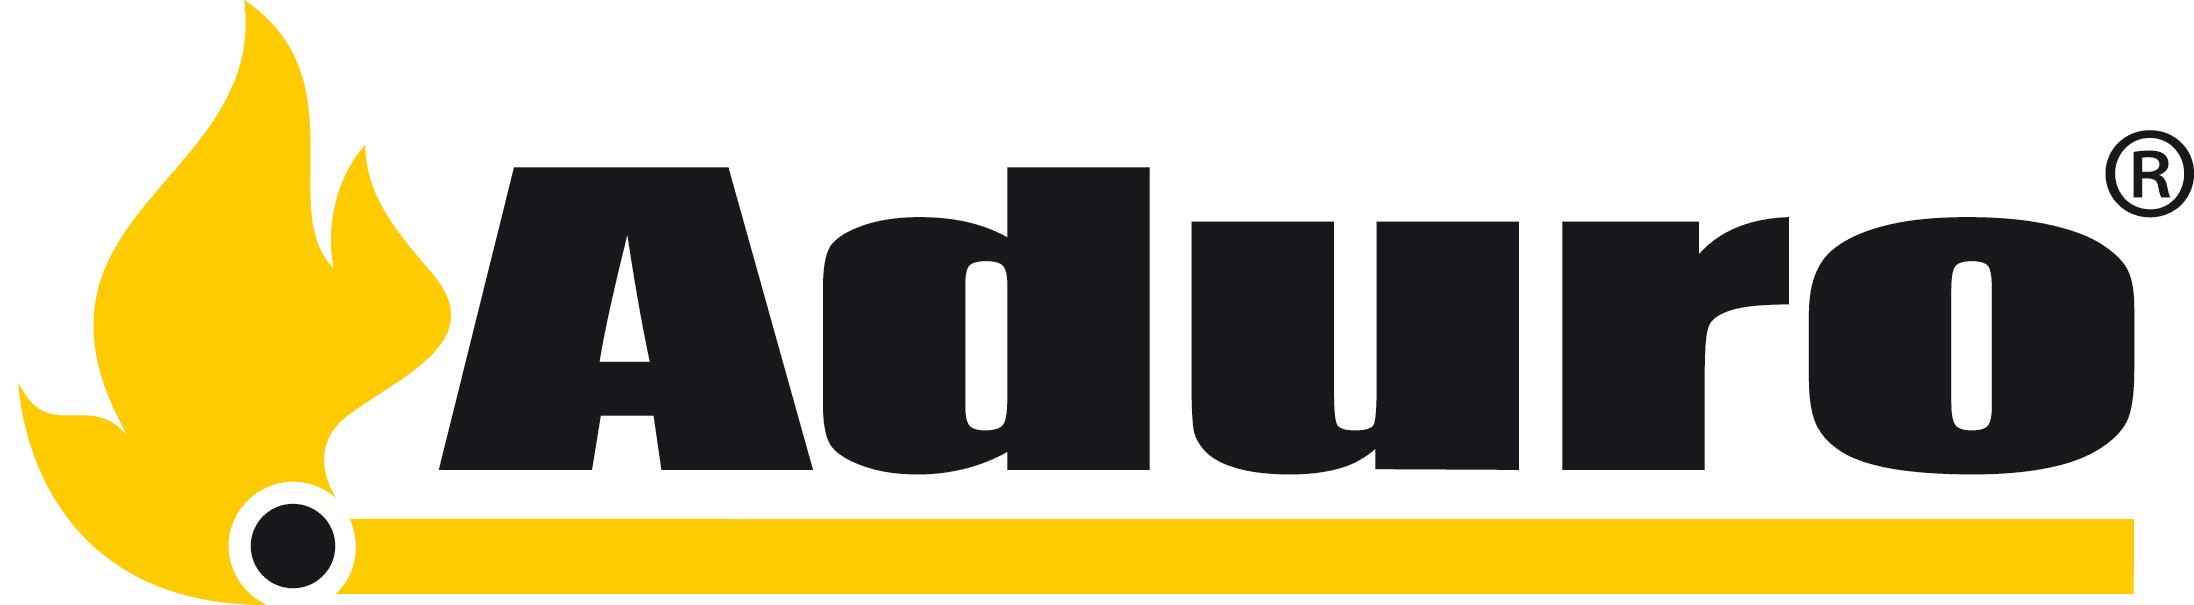 MC_Aduro